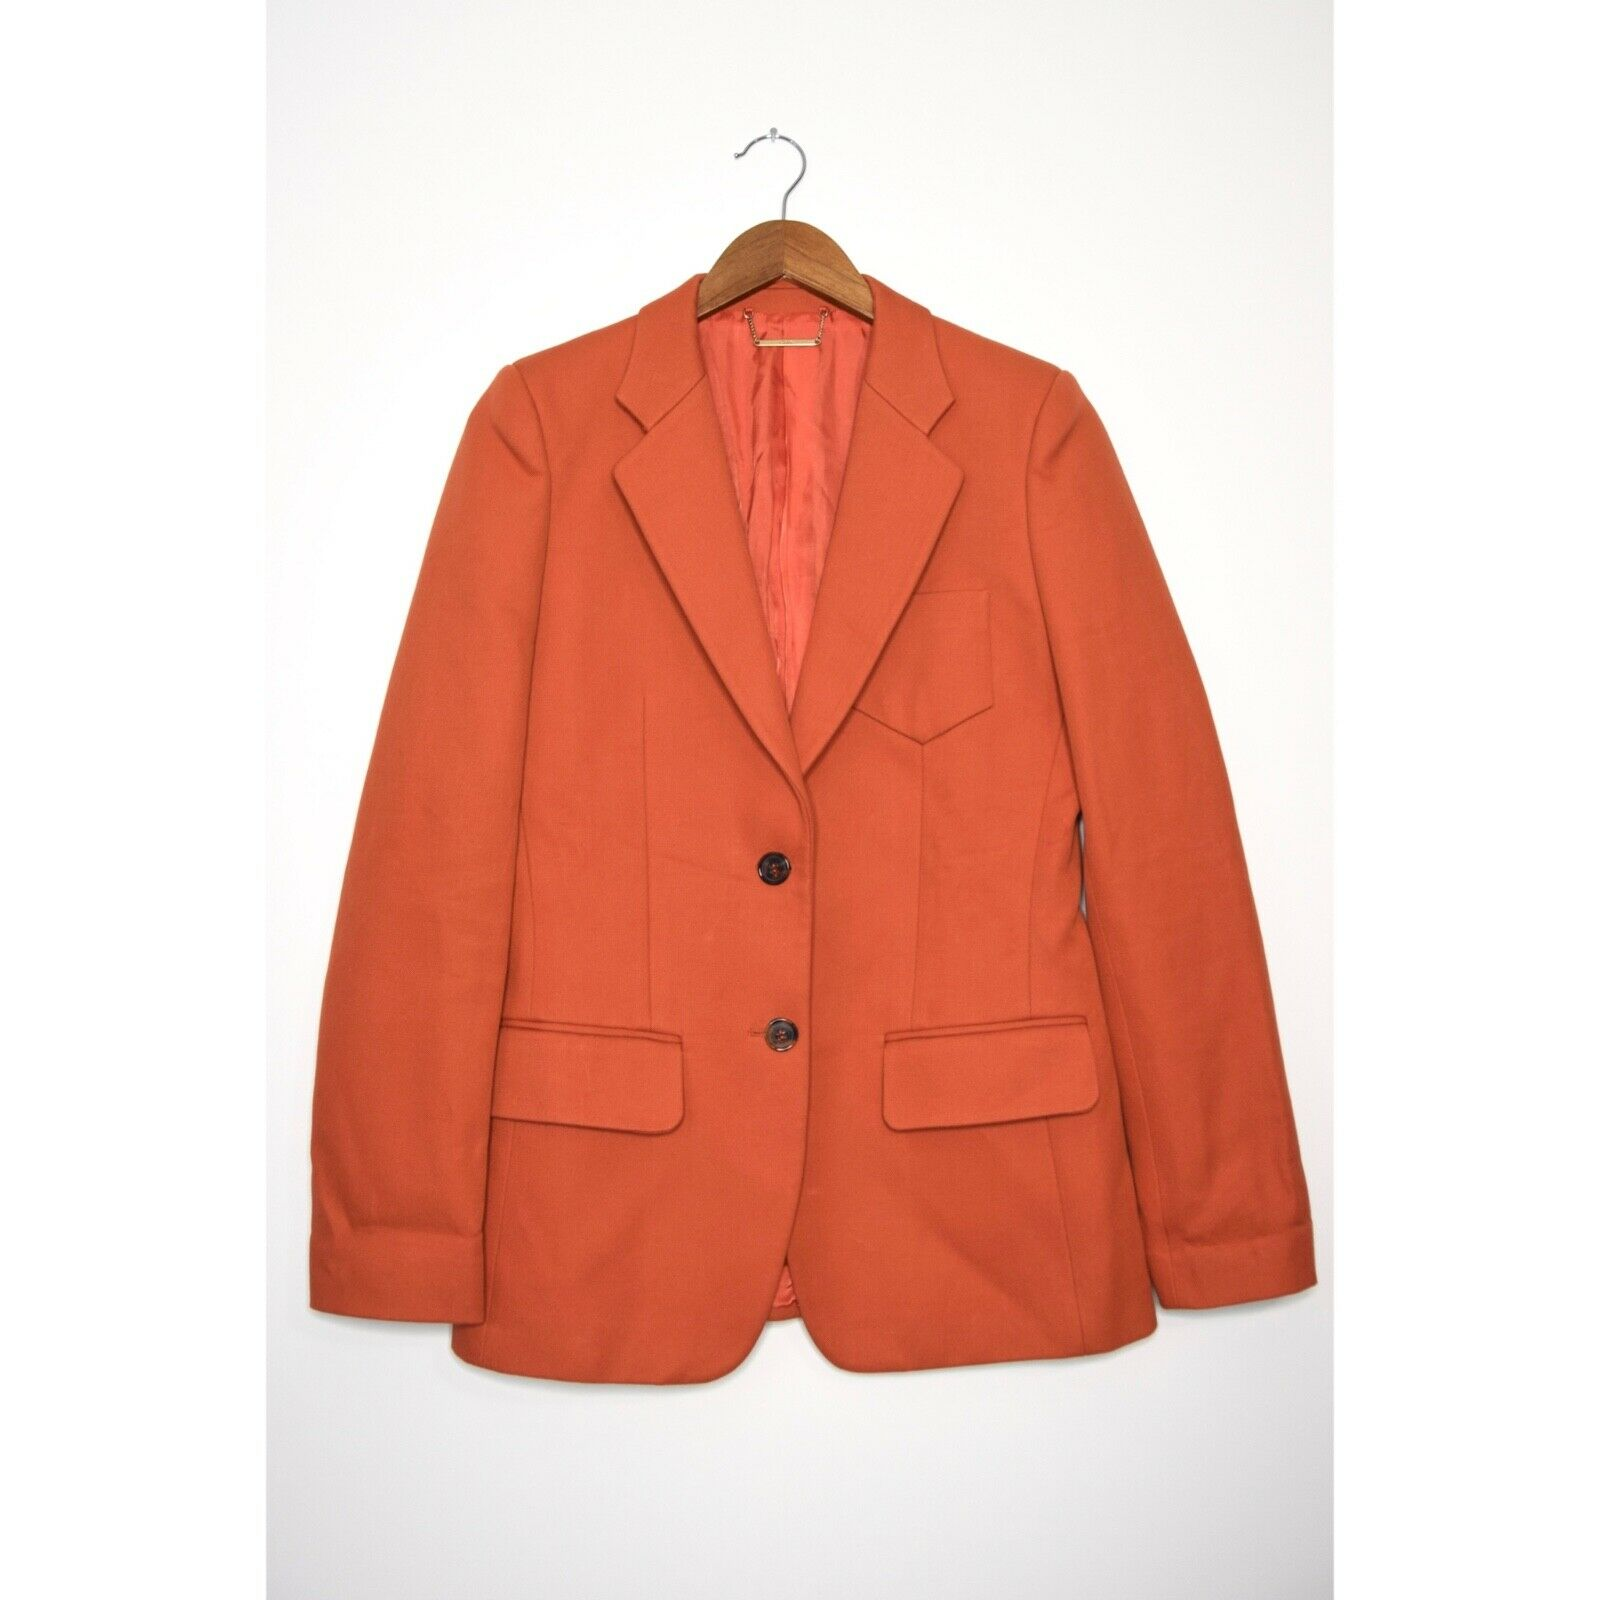 CHLOE Cotton Blazer Two Button Structured Jacket Lined Orange size 40 US 4